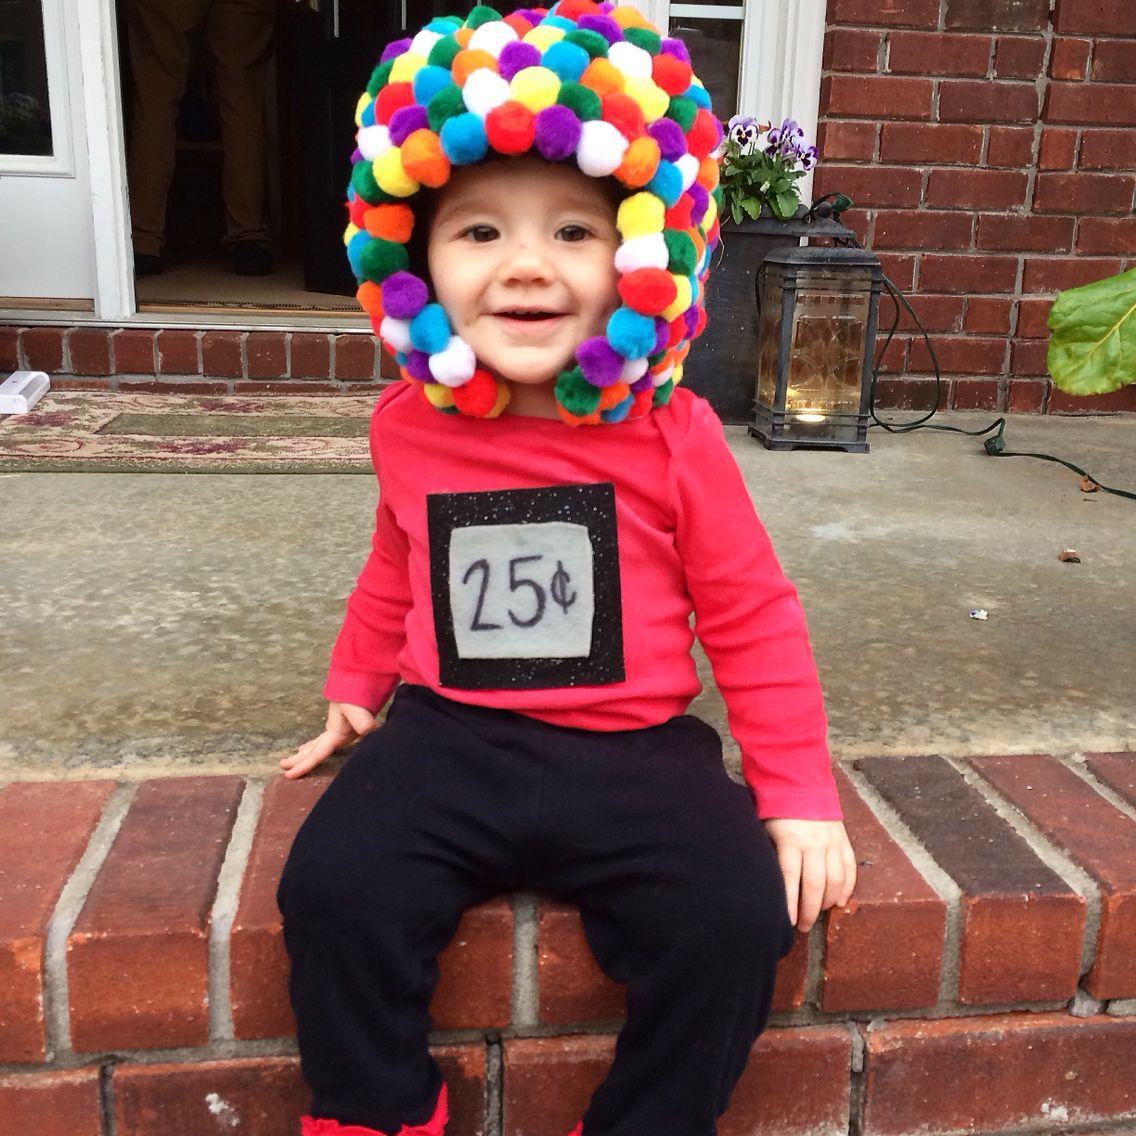 gum ball machine. 10 months. baby girl. halloween costume. diy